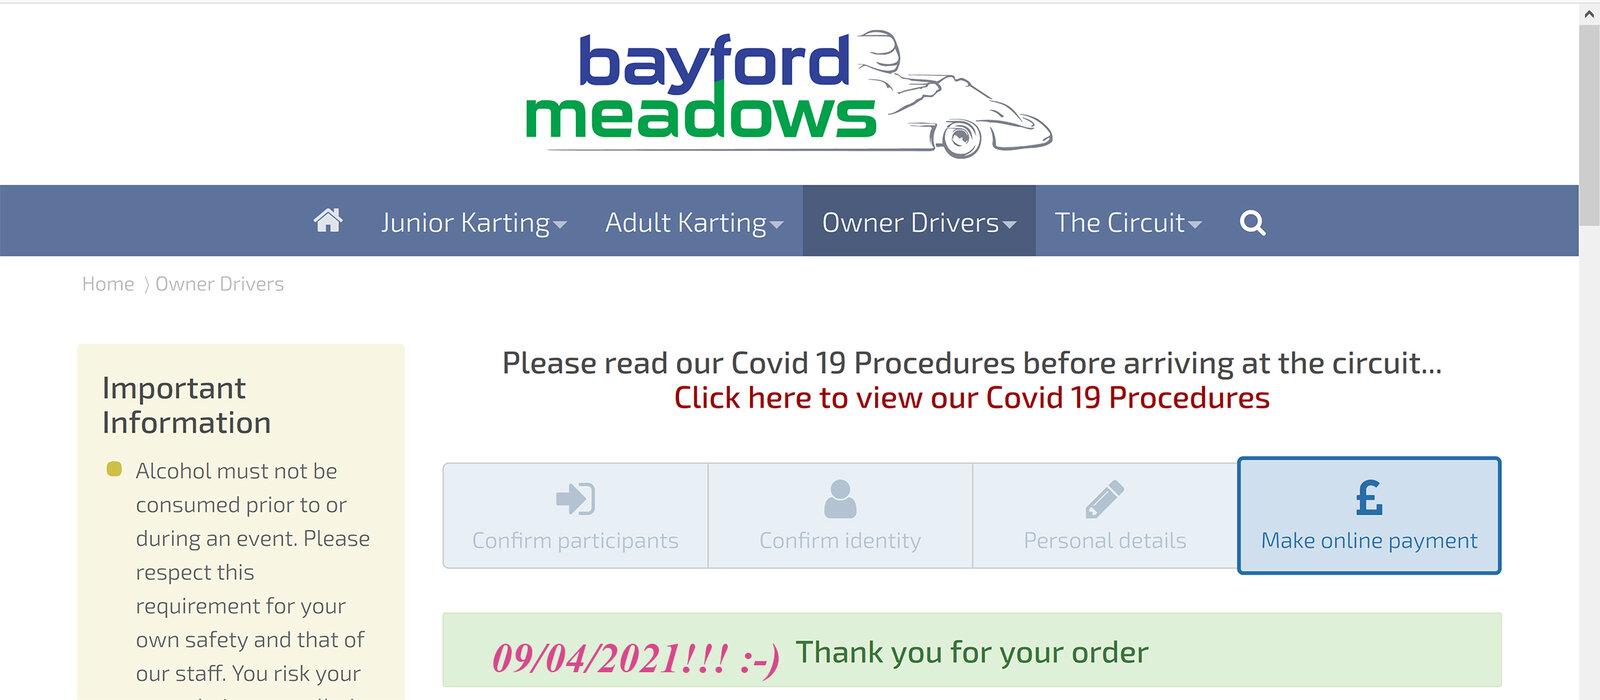 BAYFORD-MEADOWS.jpg